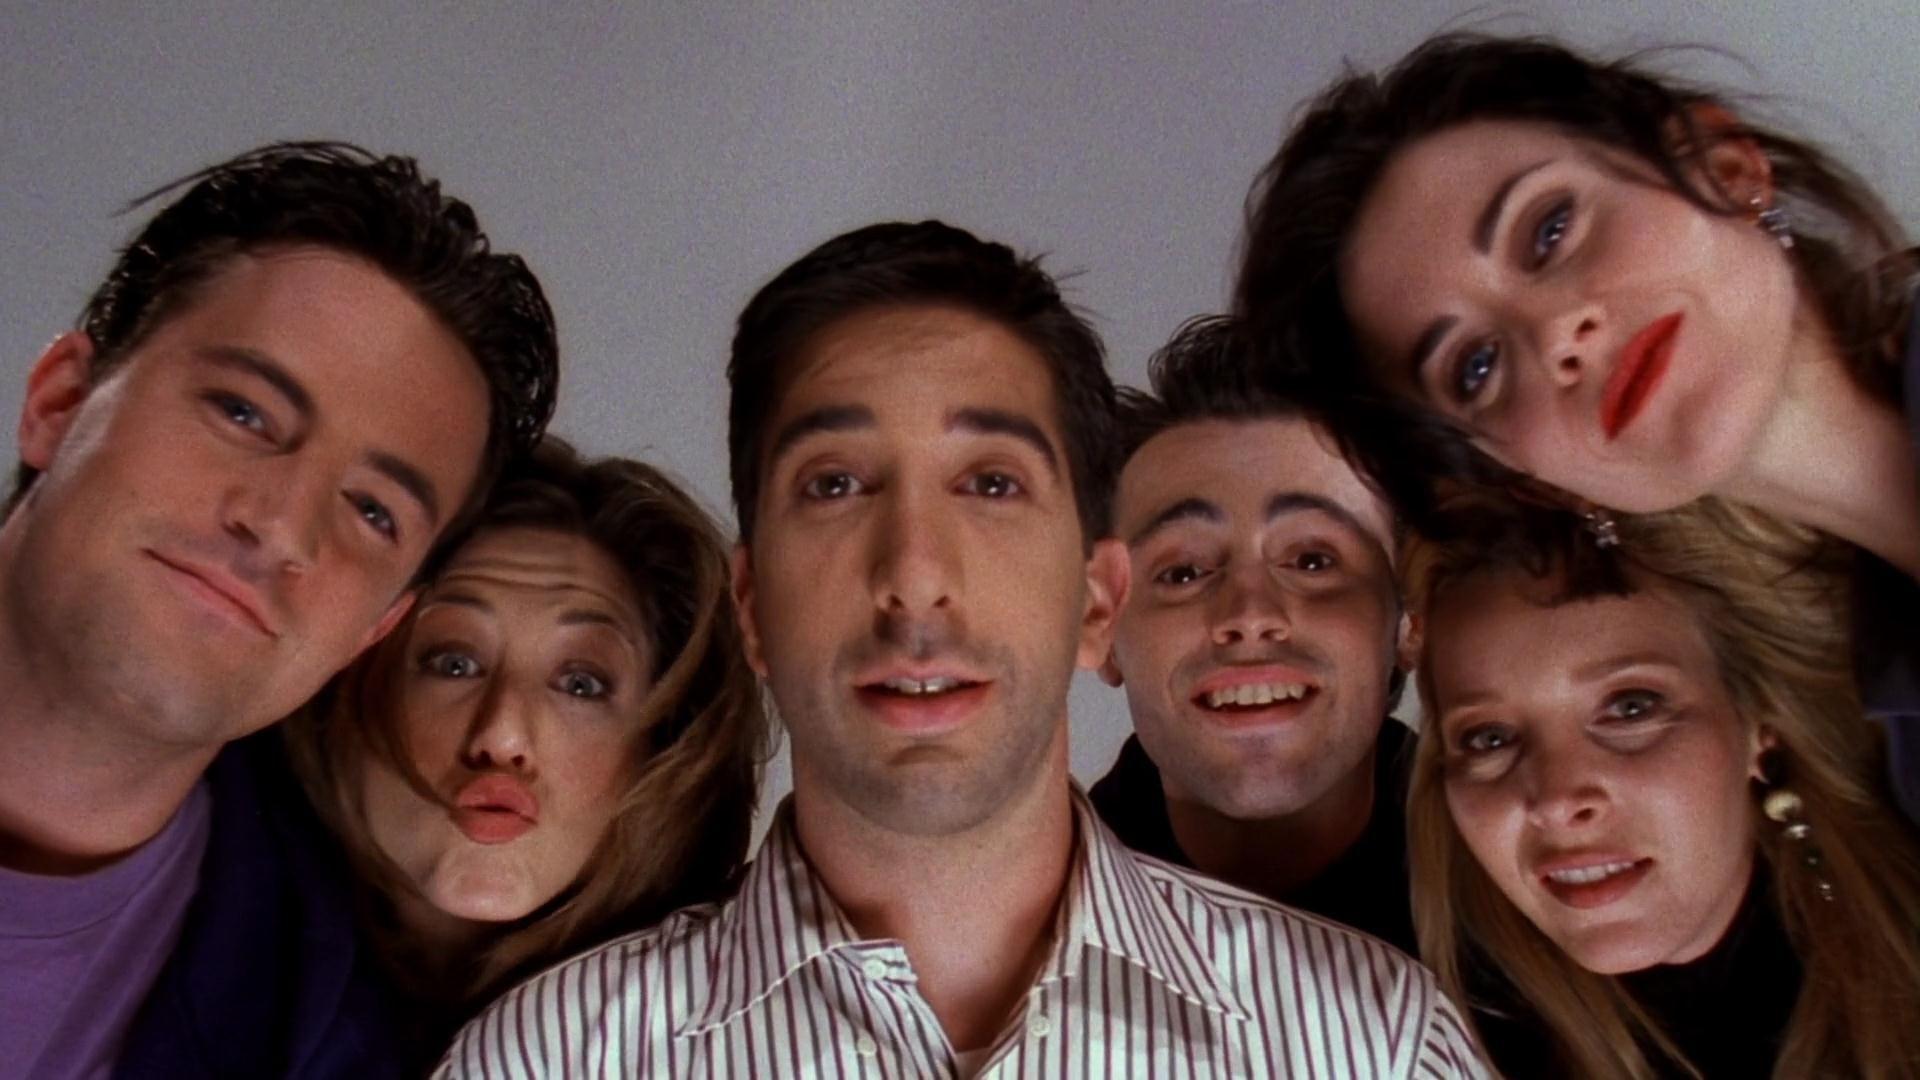 Friends - Friends Cast Looking At Ben , HD Wallpaper & Backgrounds